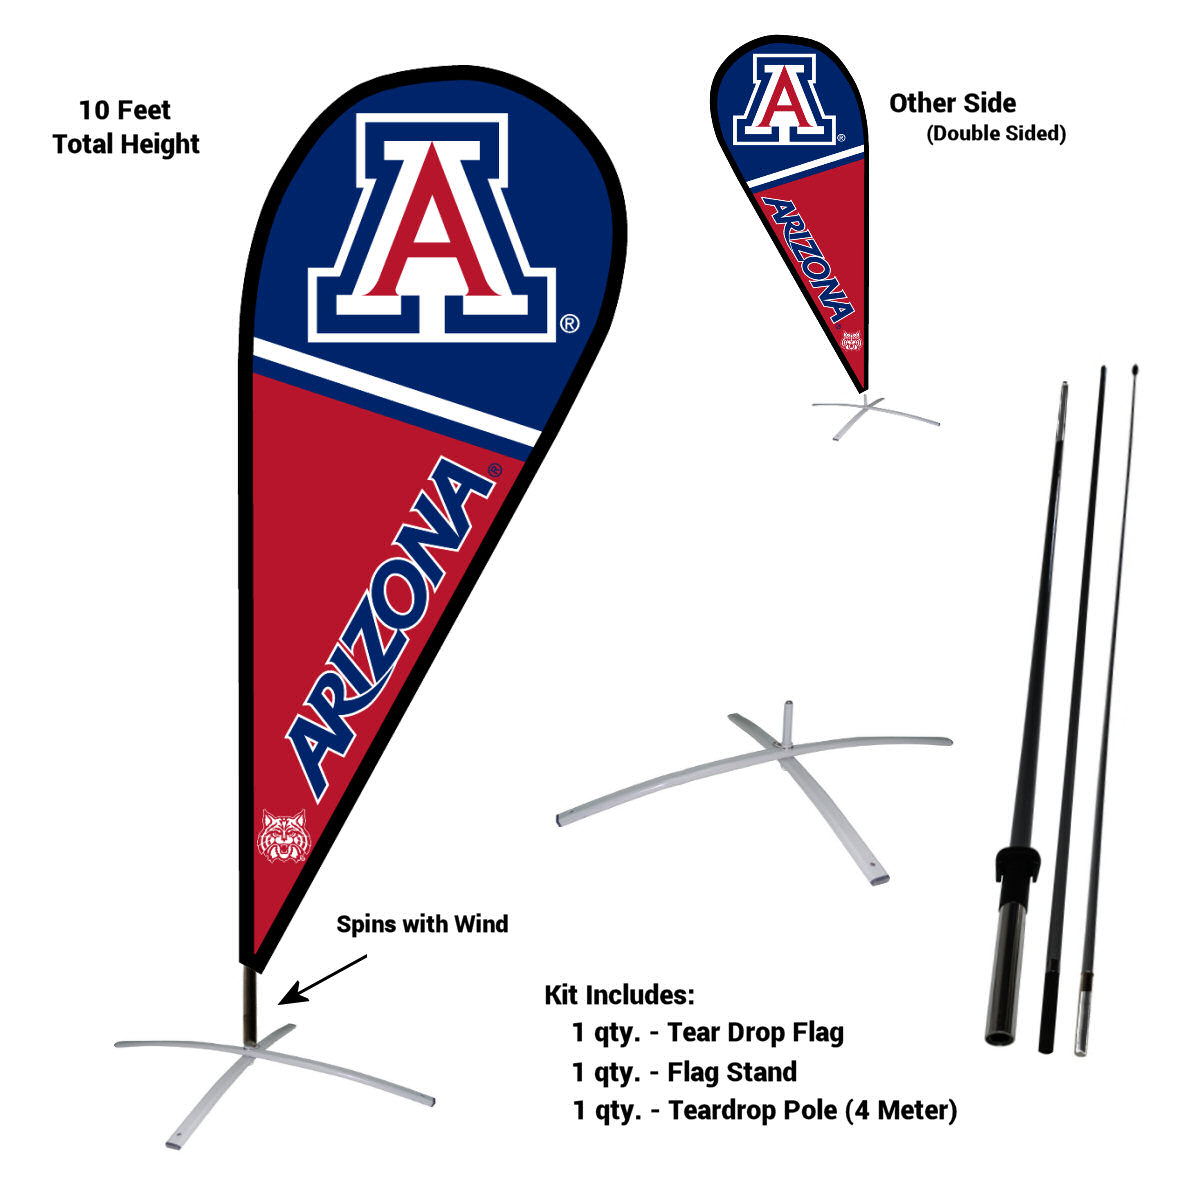 University of Arizona Wildcats Teardrop Flag Pole and Stand Kit